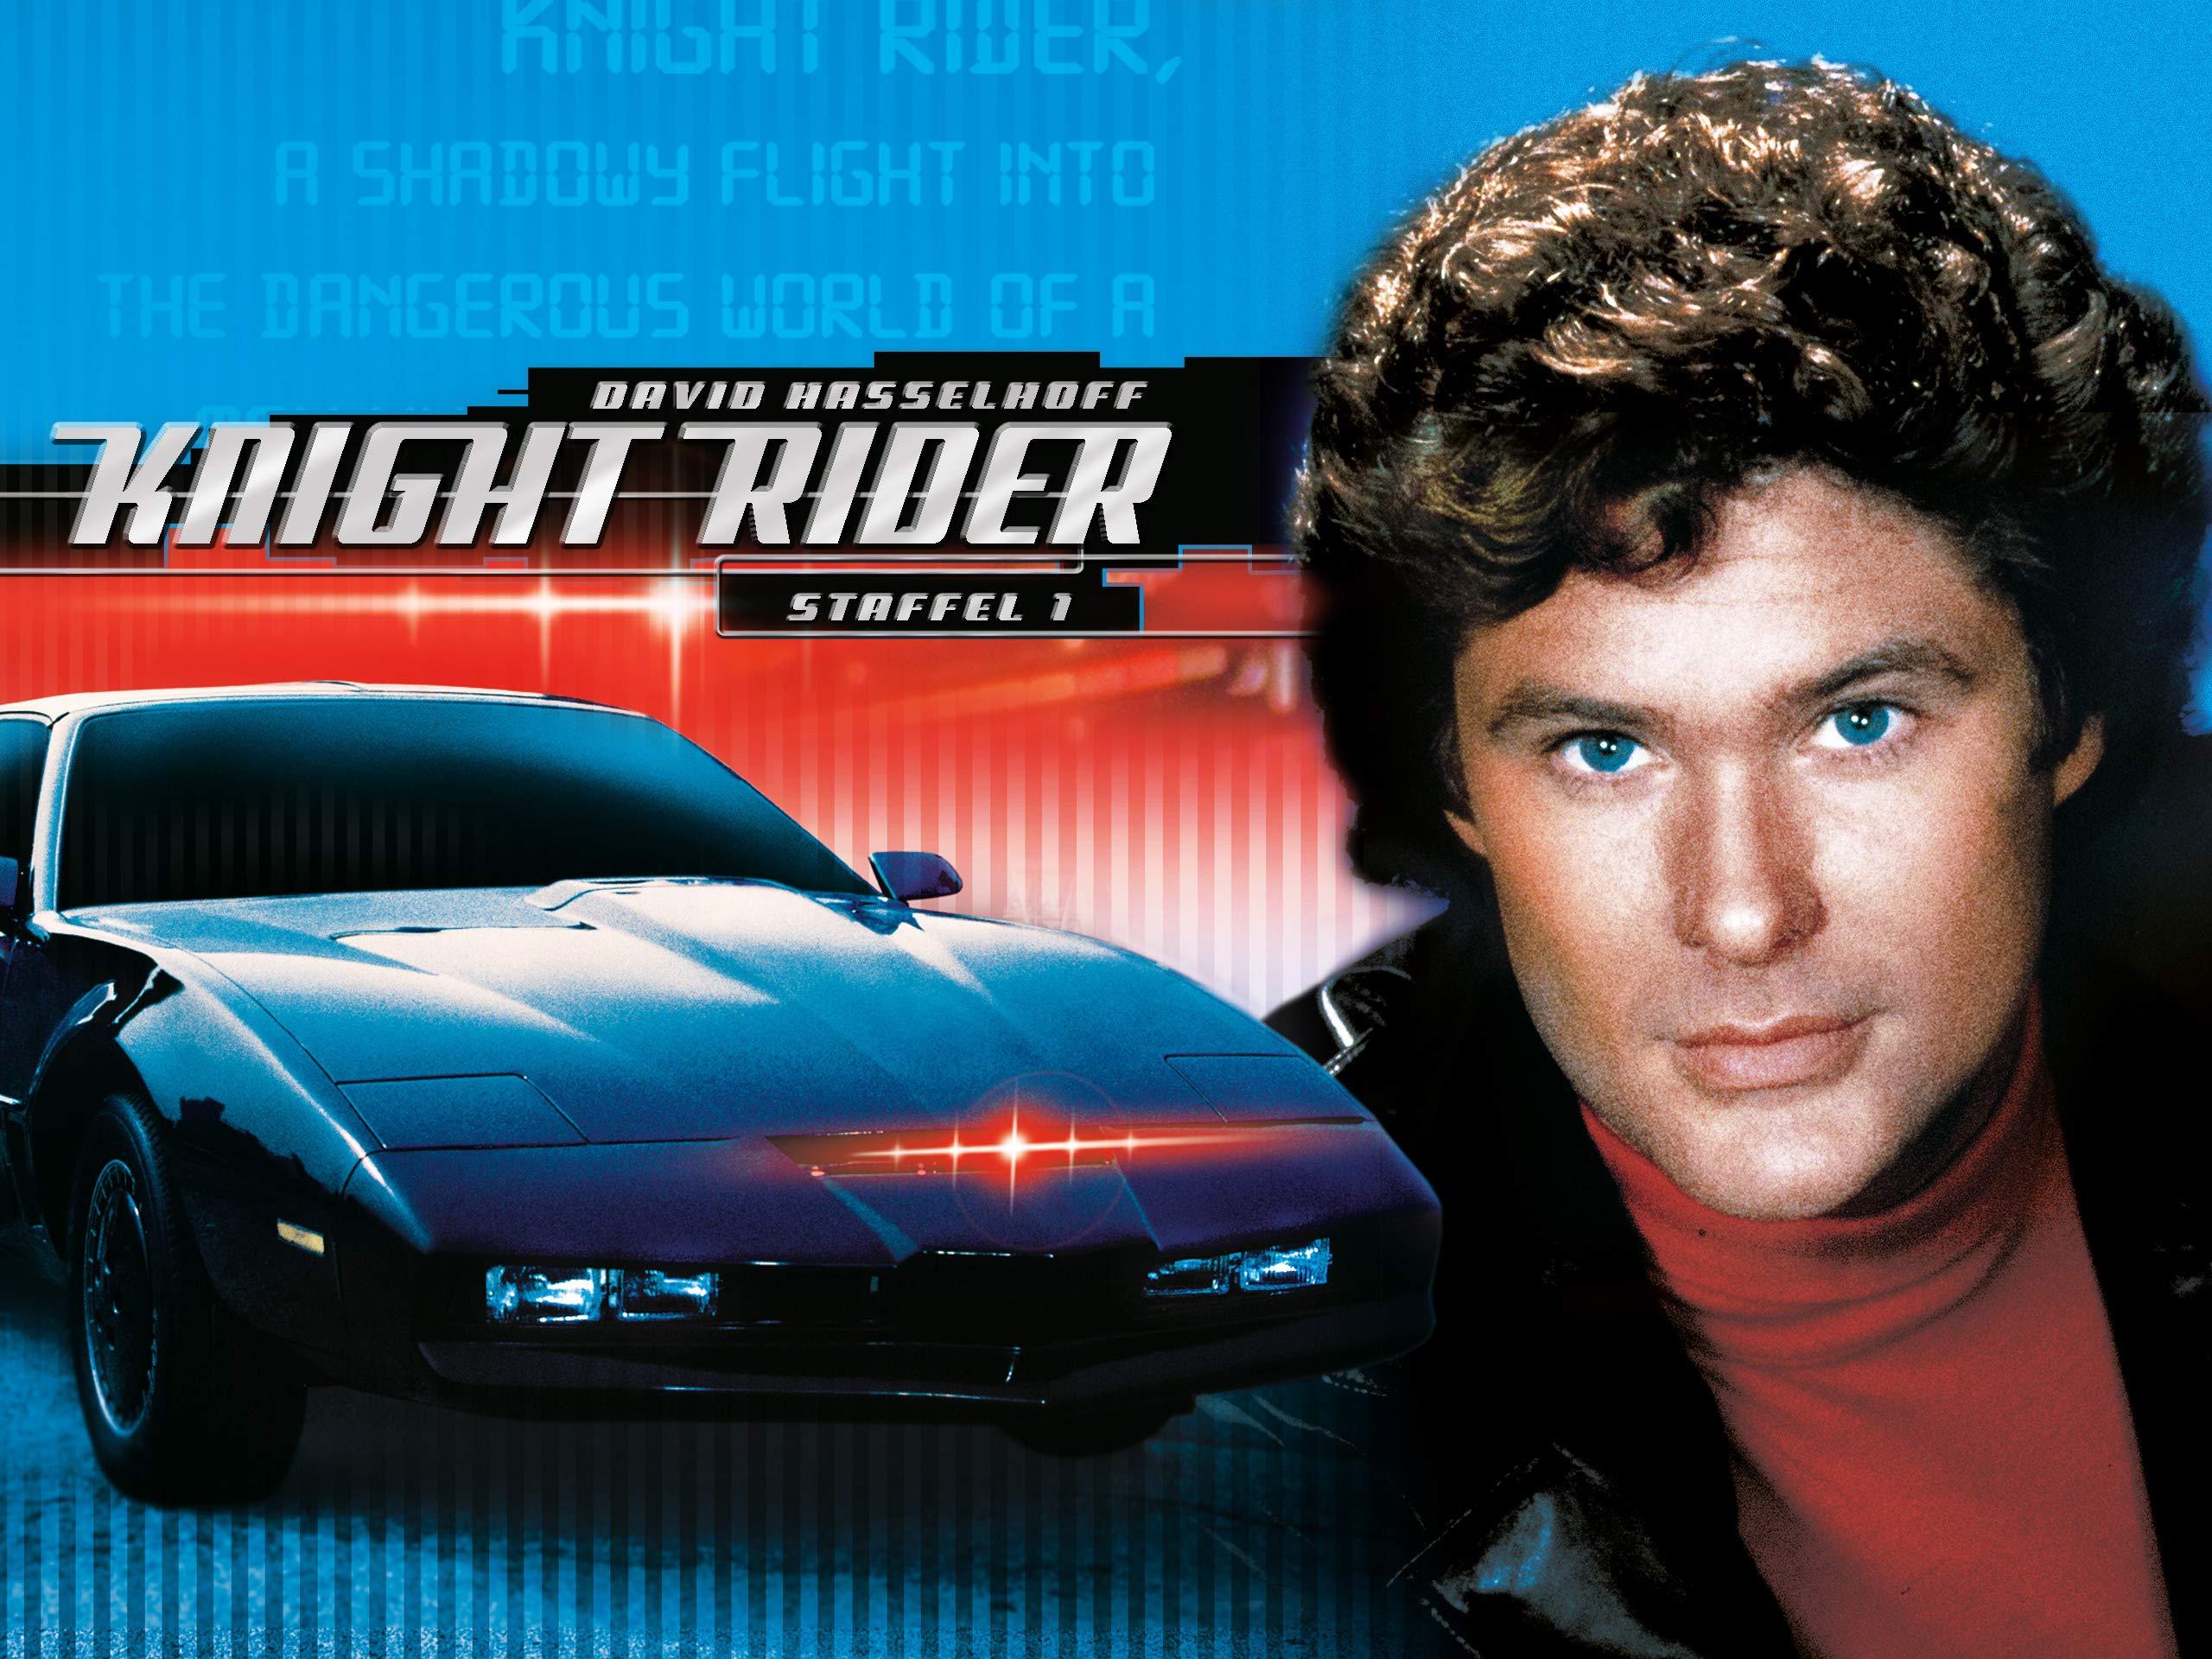 [AmazonVideo] Knight Rider Staffel 1 zum Kaufen